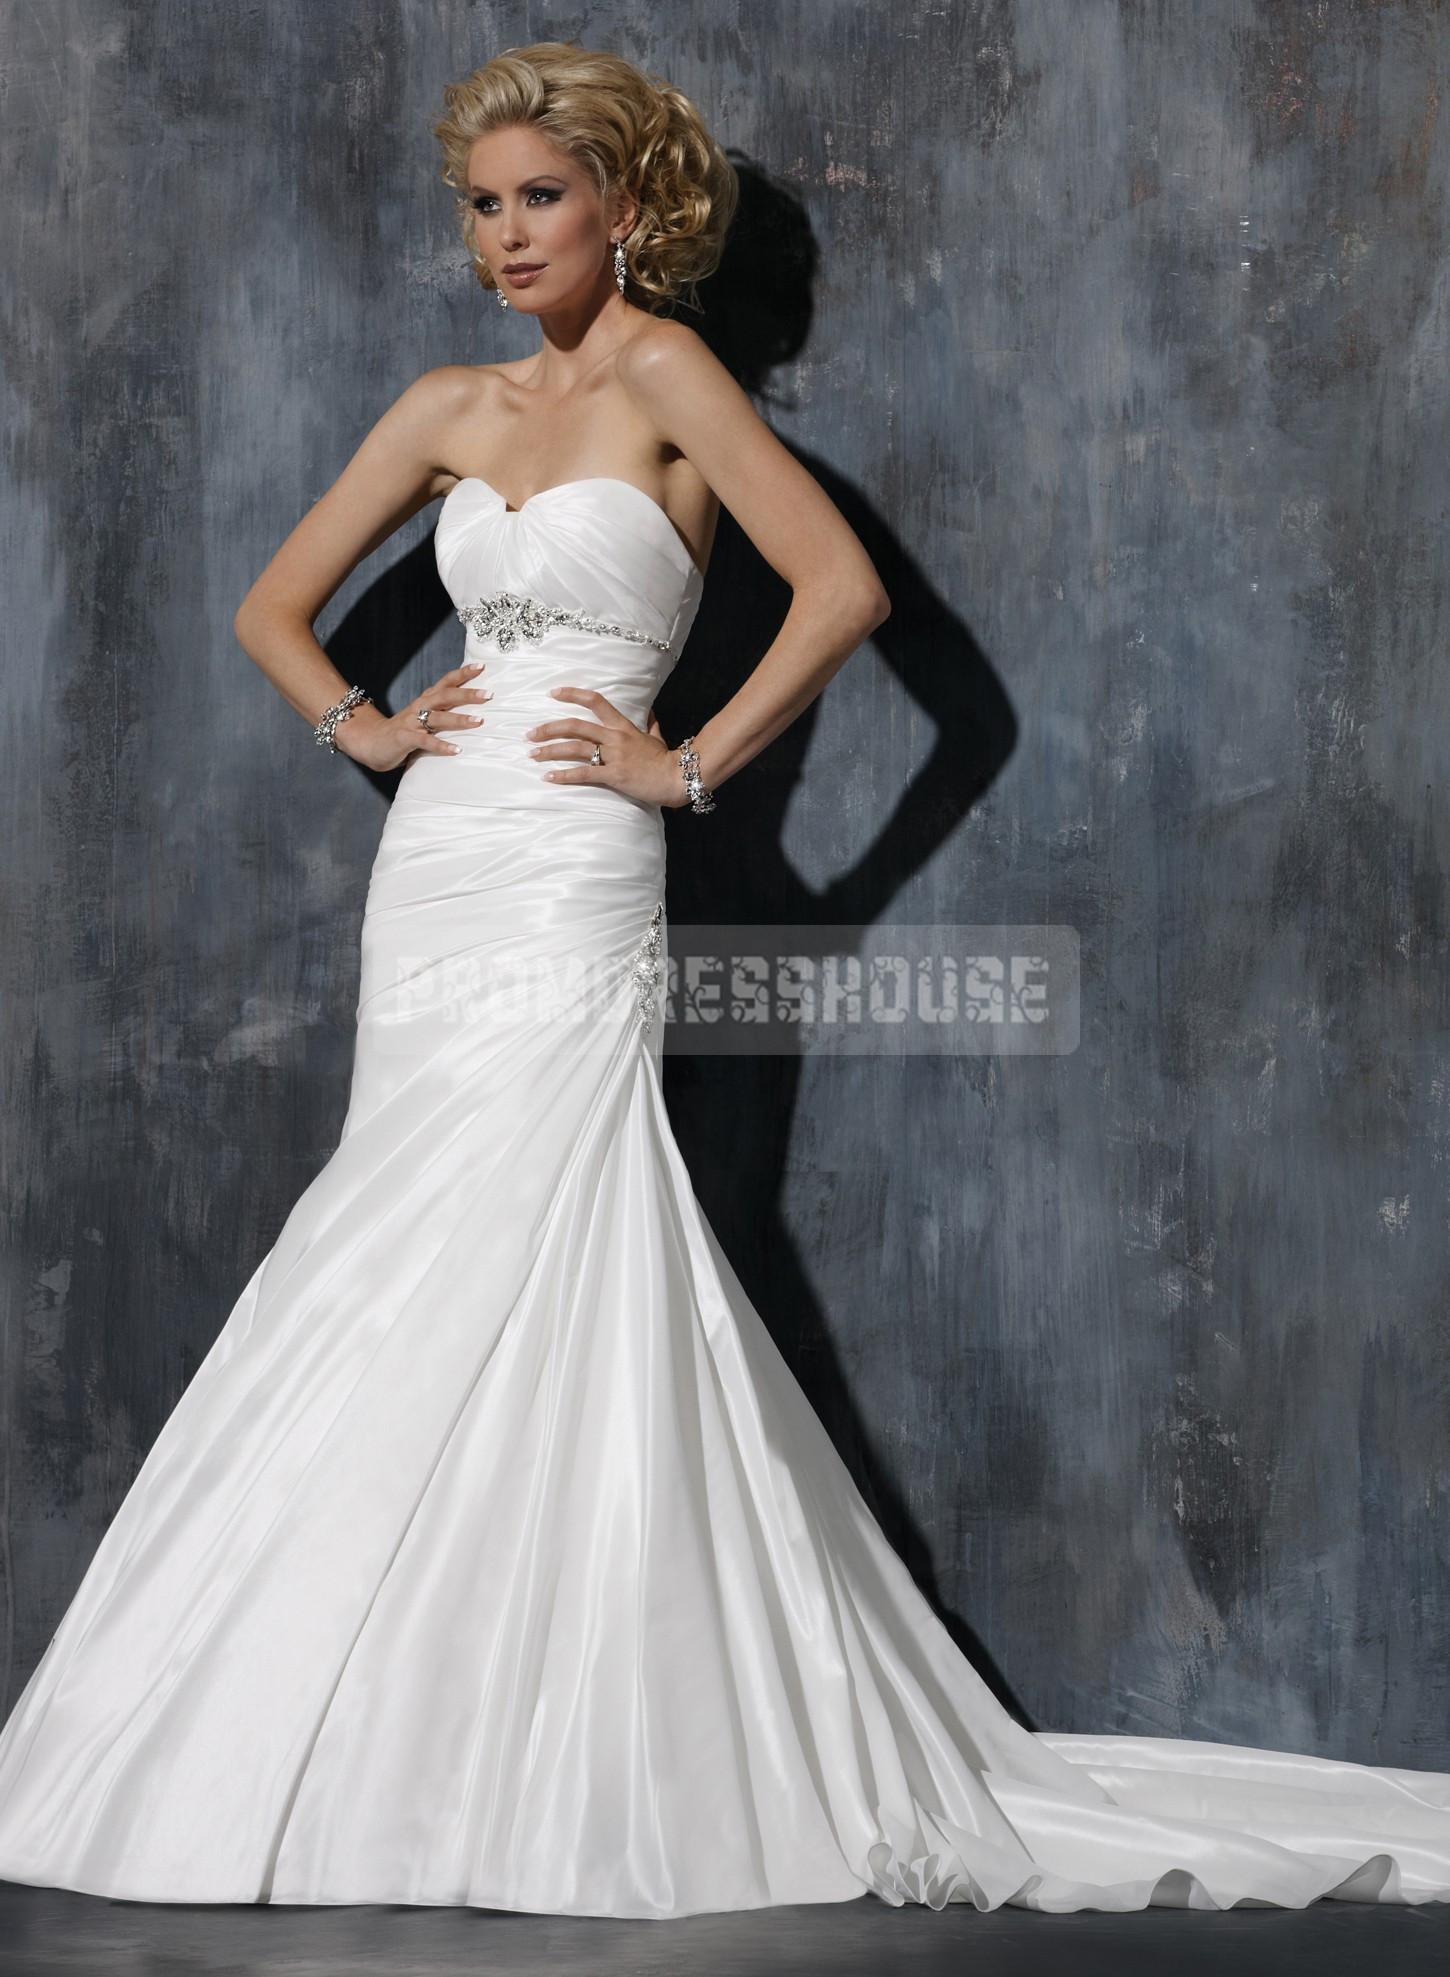 Beading Taffeta Lace-up Empire Strapless Wedding Dress - Promdresshouse.com